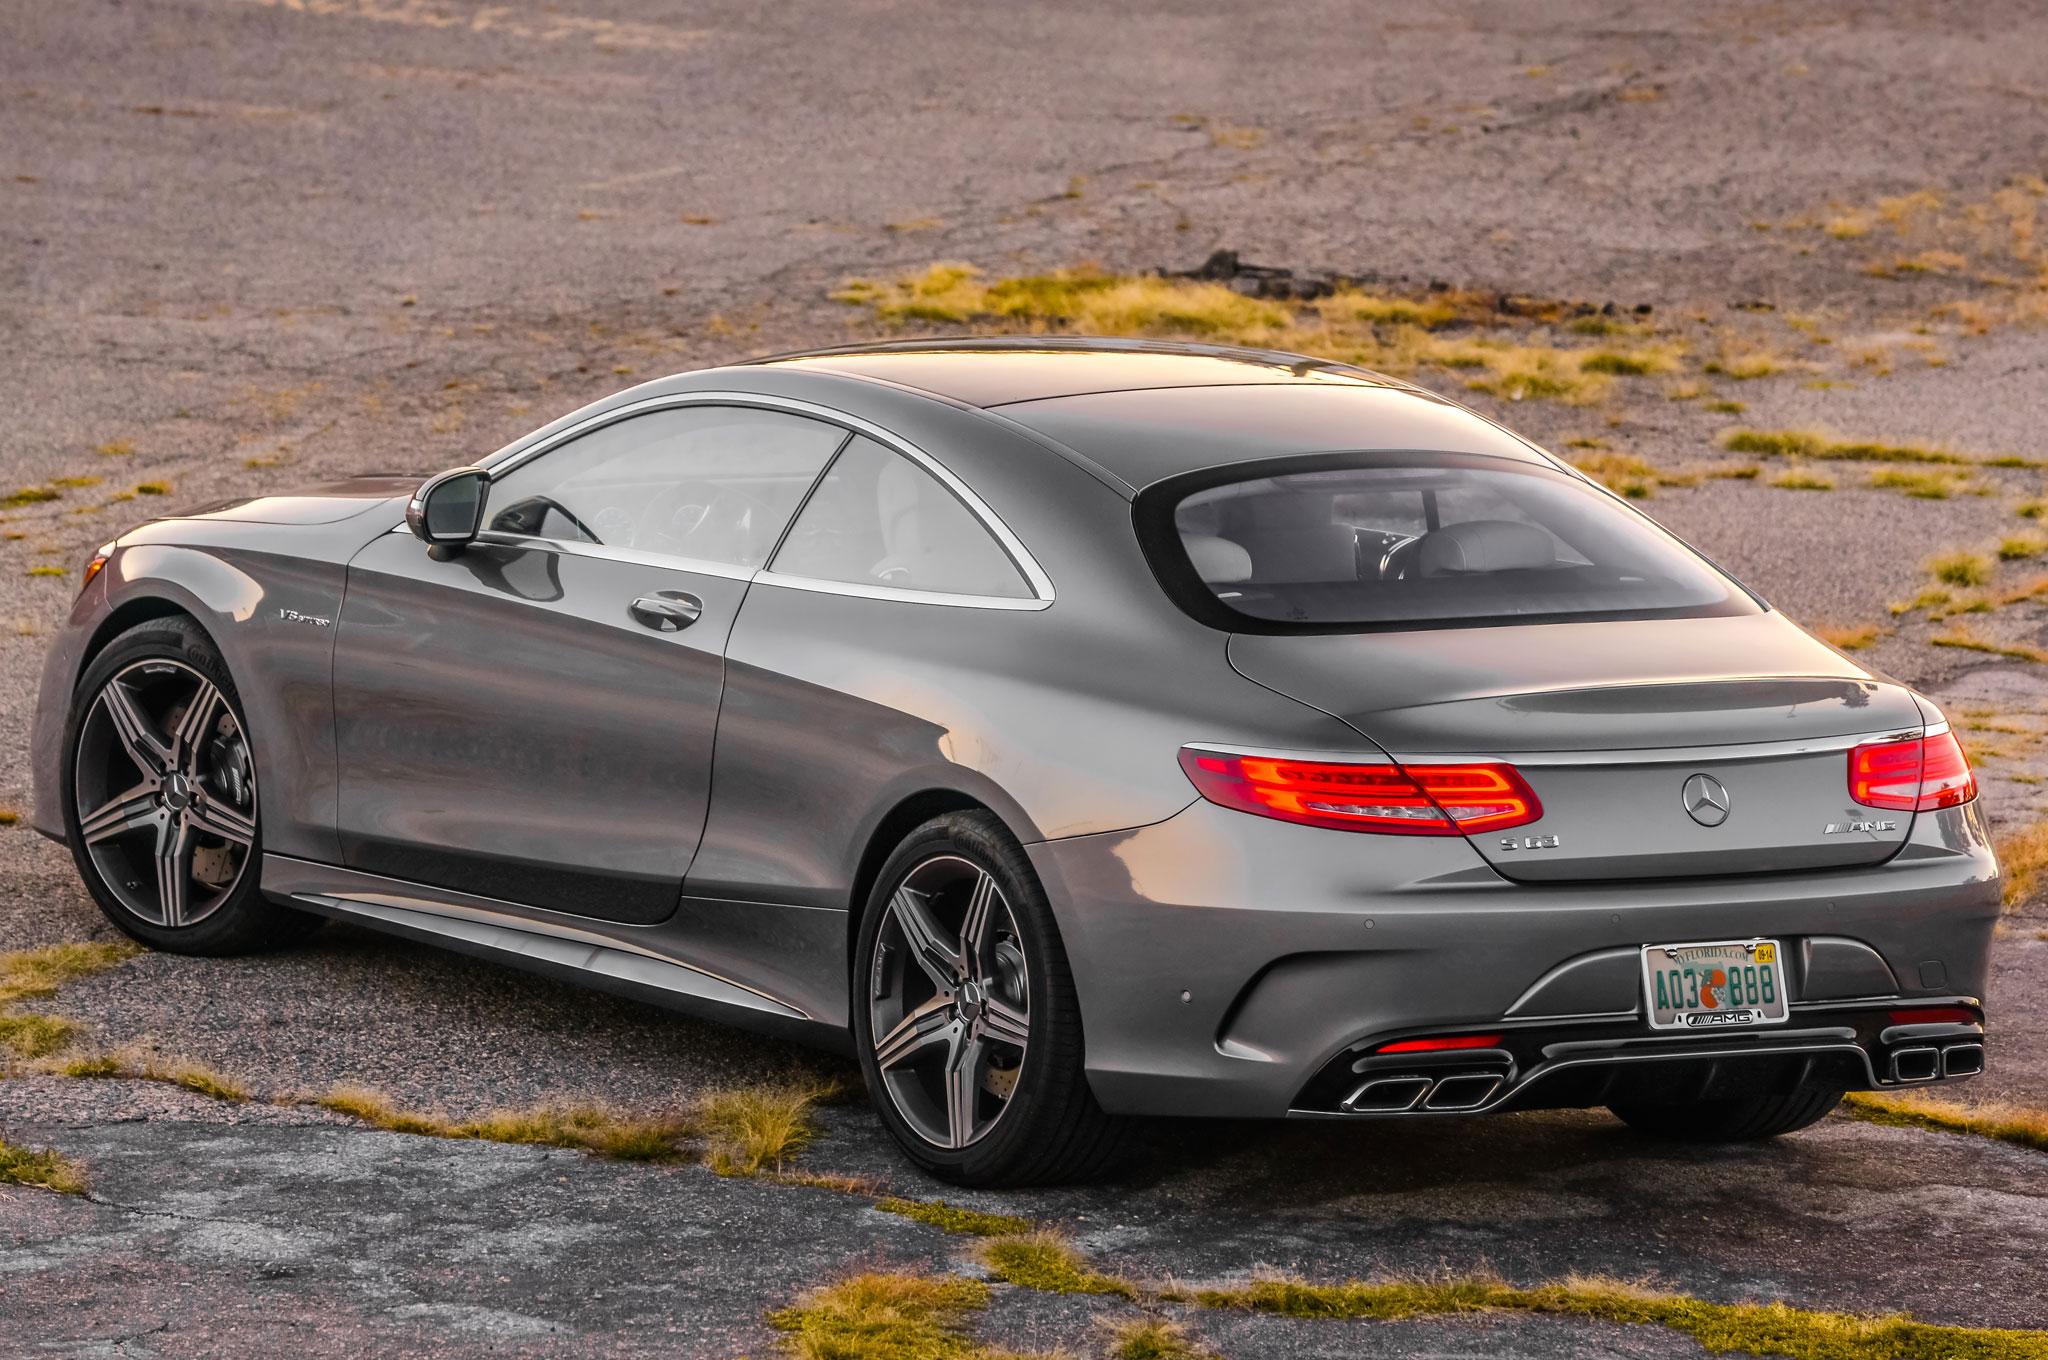 http://st.automobilemag.com/uploads/sites/11/2014/11/2015-Mercedes-Benz-S63-AMG-coupe-rear-three-quarter-view.jpg